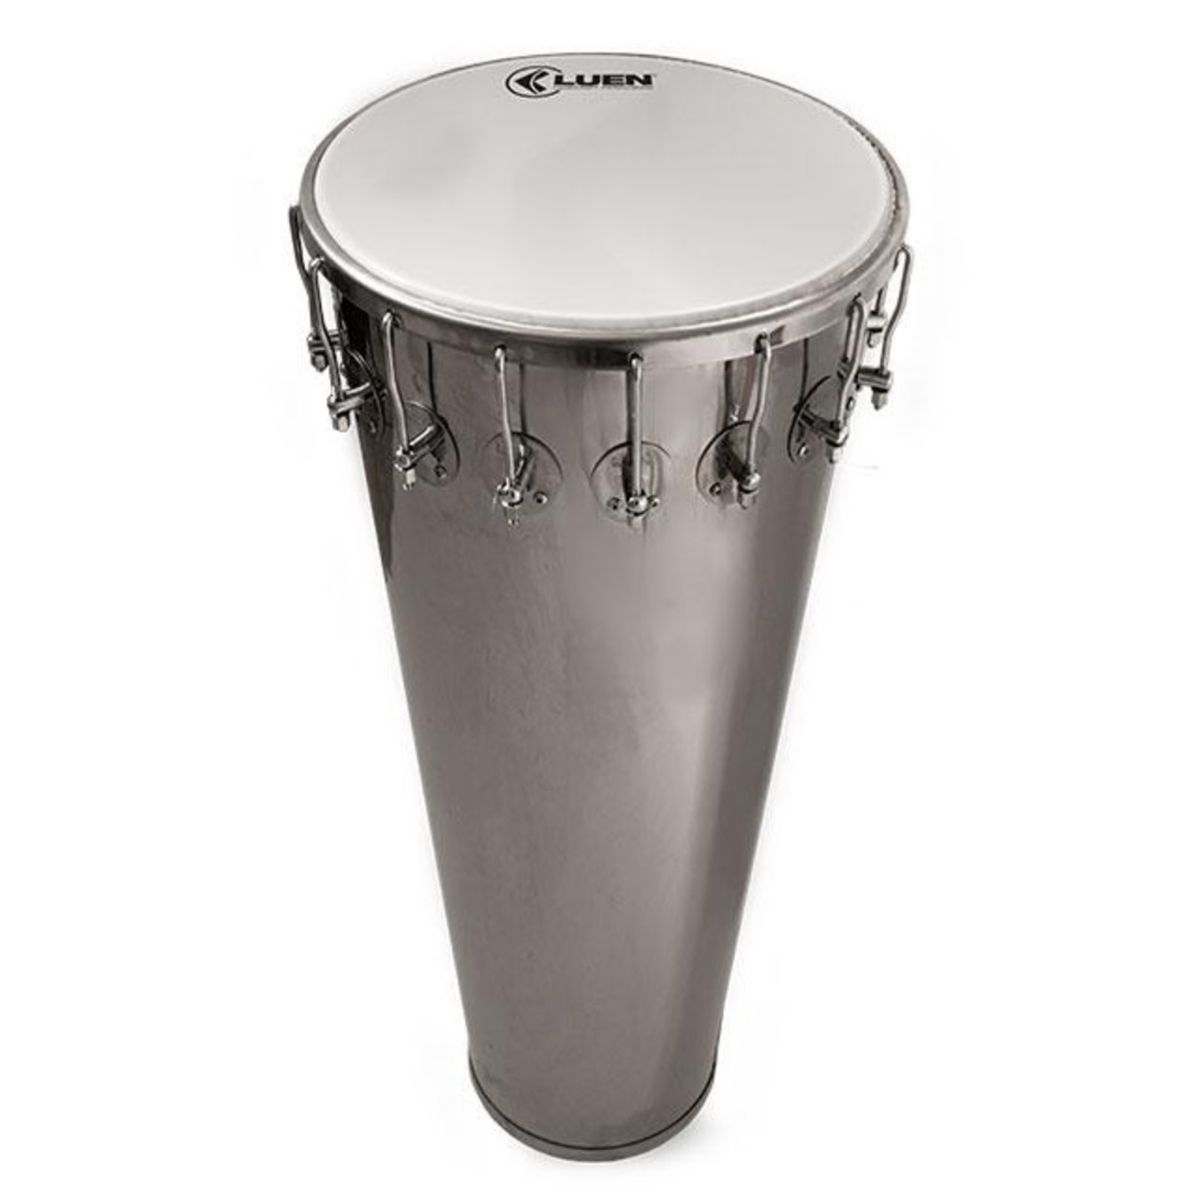 Timbal Luen Percussion 90x14 Inox Cromadas com Pele Leitosa